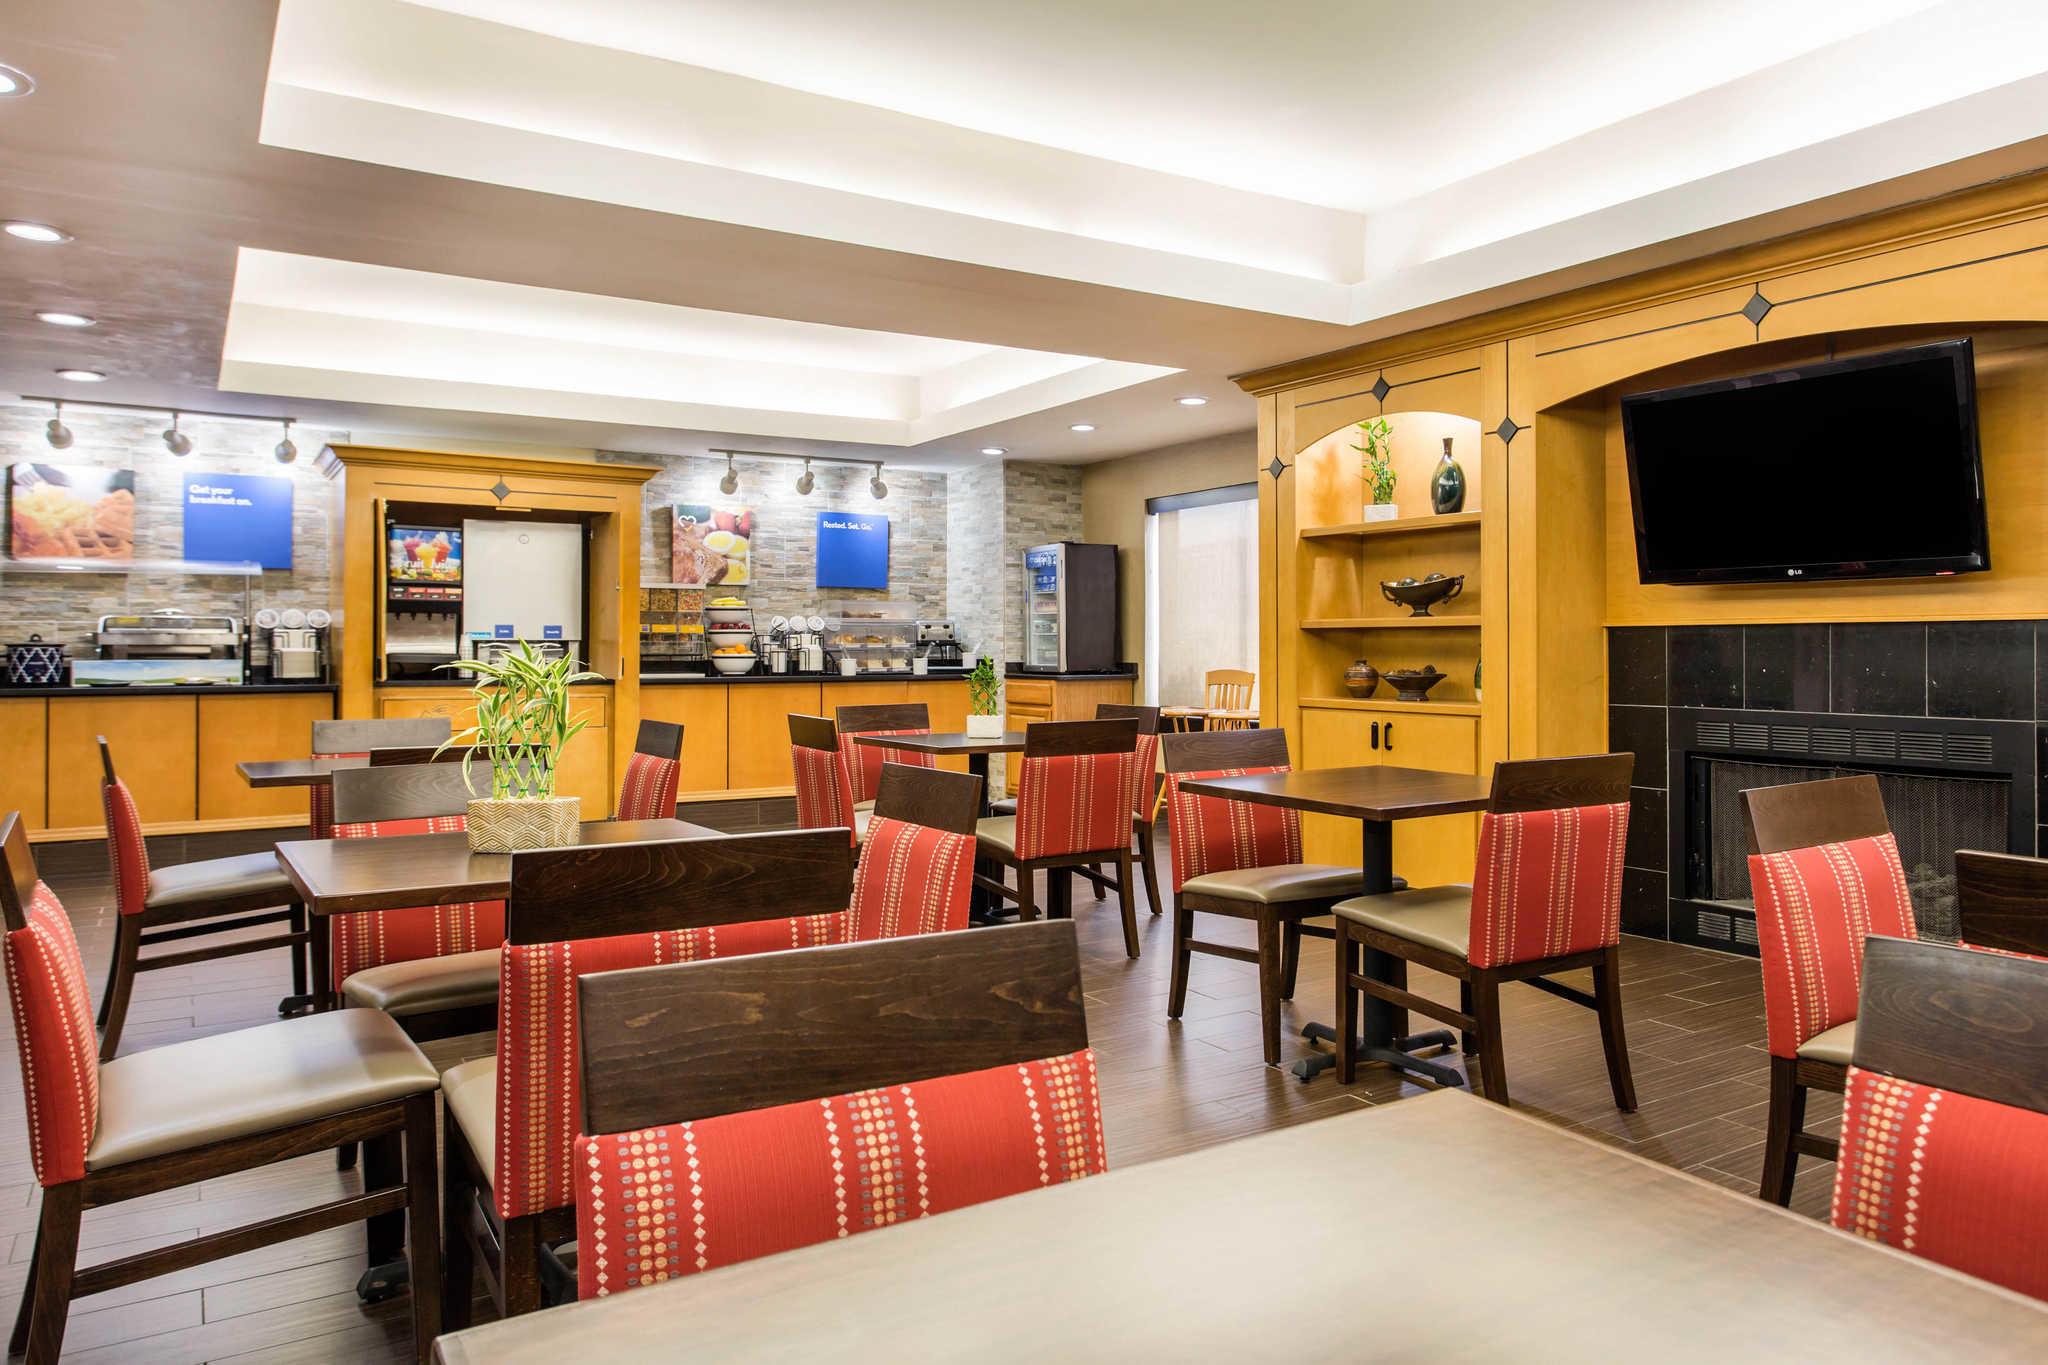 Comfort Inn & Suites Crabtree Valley image 32